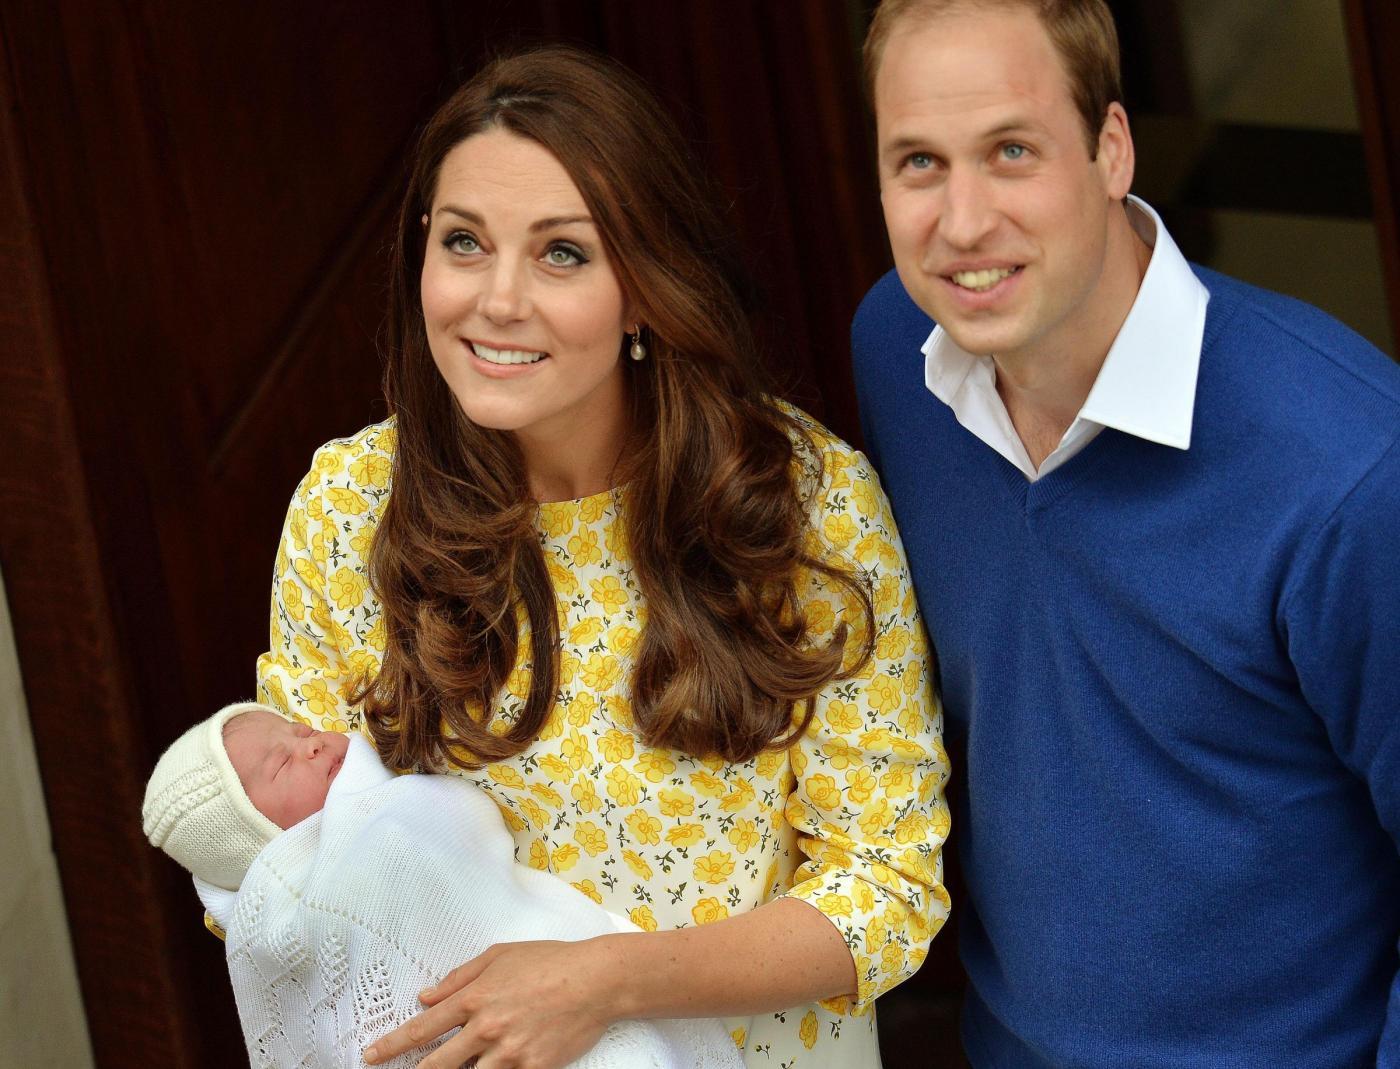 Royal Baby, ecco il nome: Charlotte Elizabeth Diana